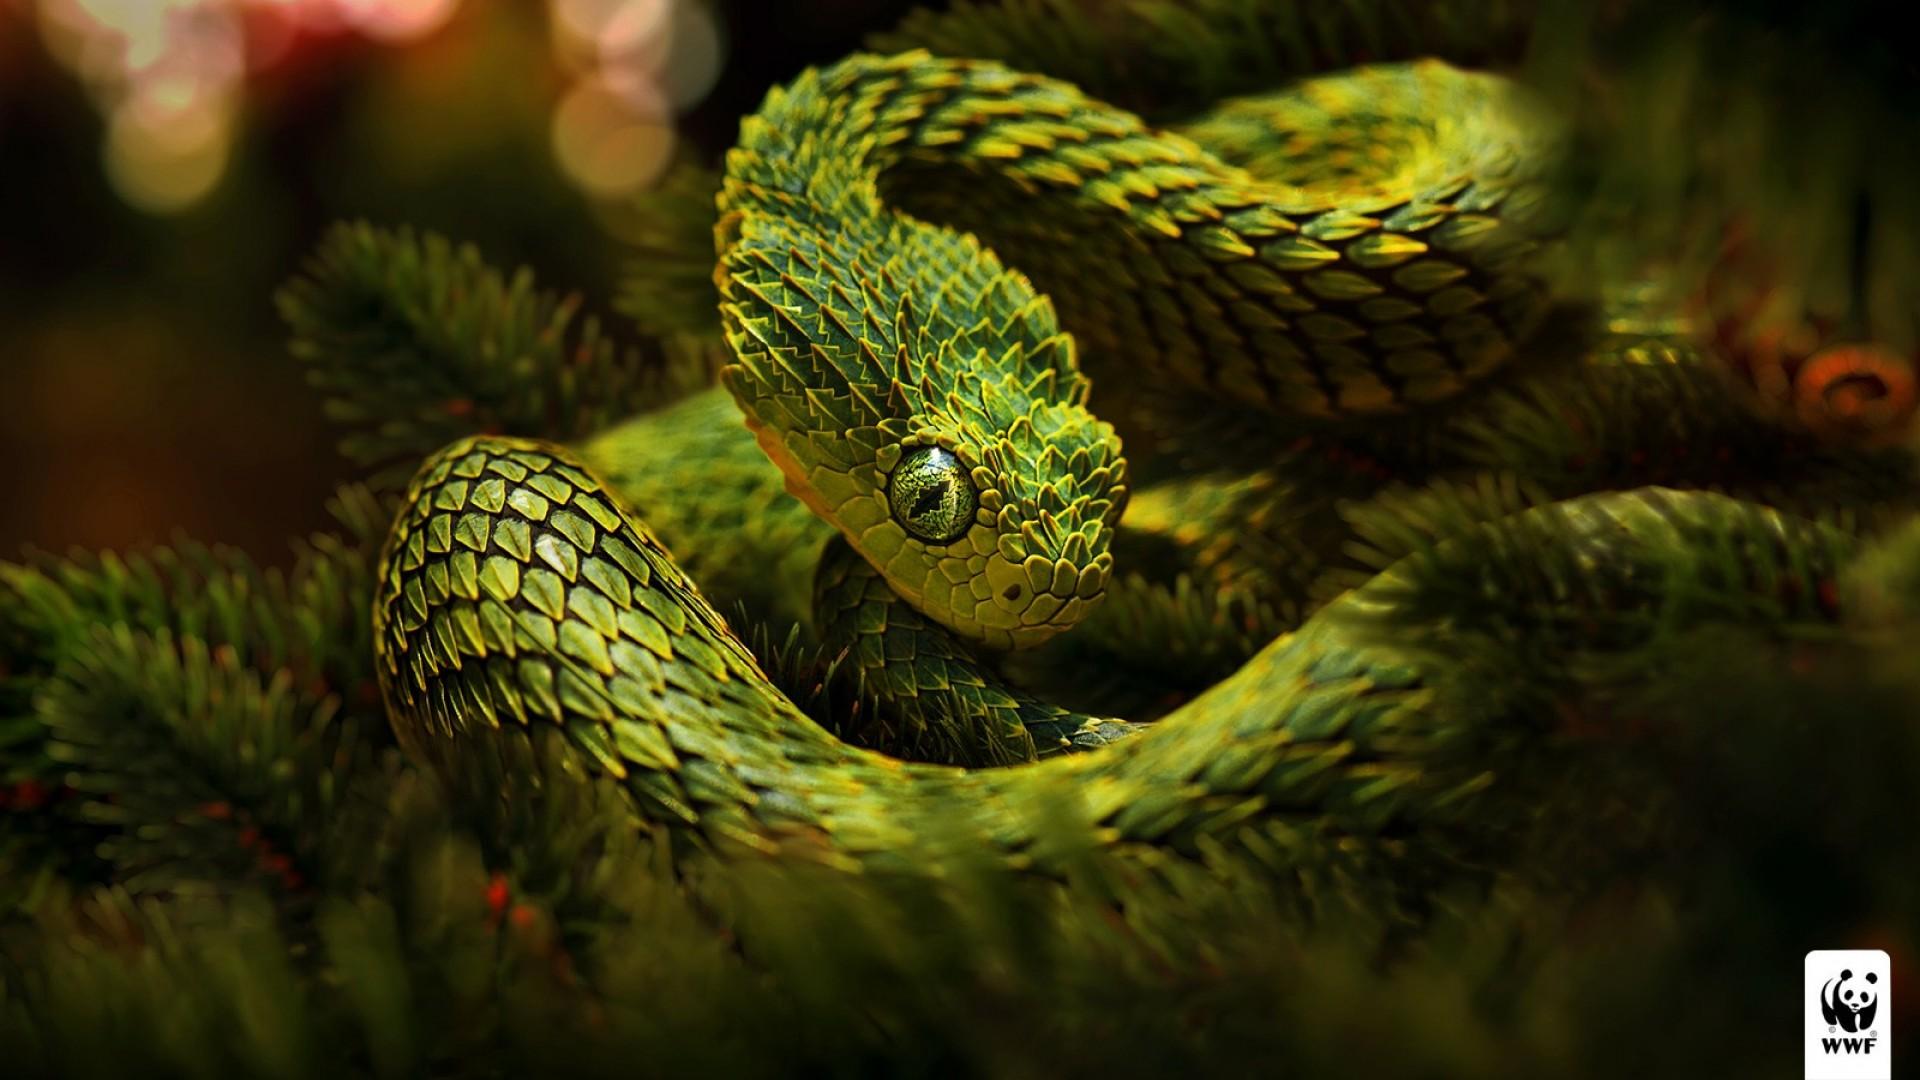 Happy New Year 2016 3d Wallpaper For Pc Viper Snake Hd Wallpapers Pixelstalk Net